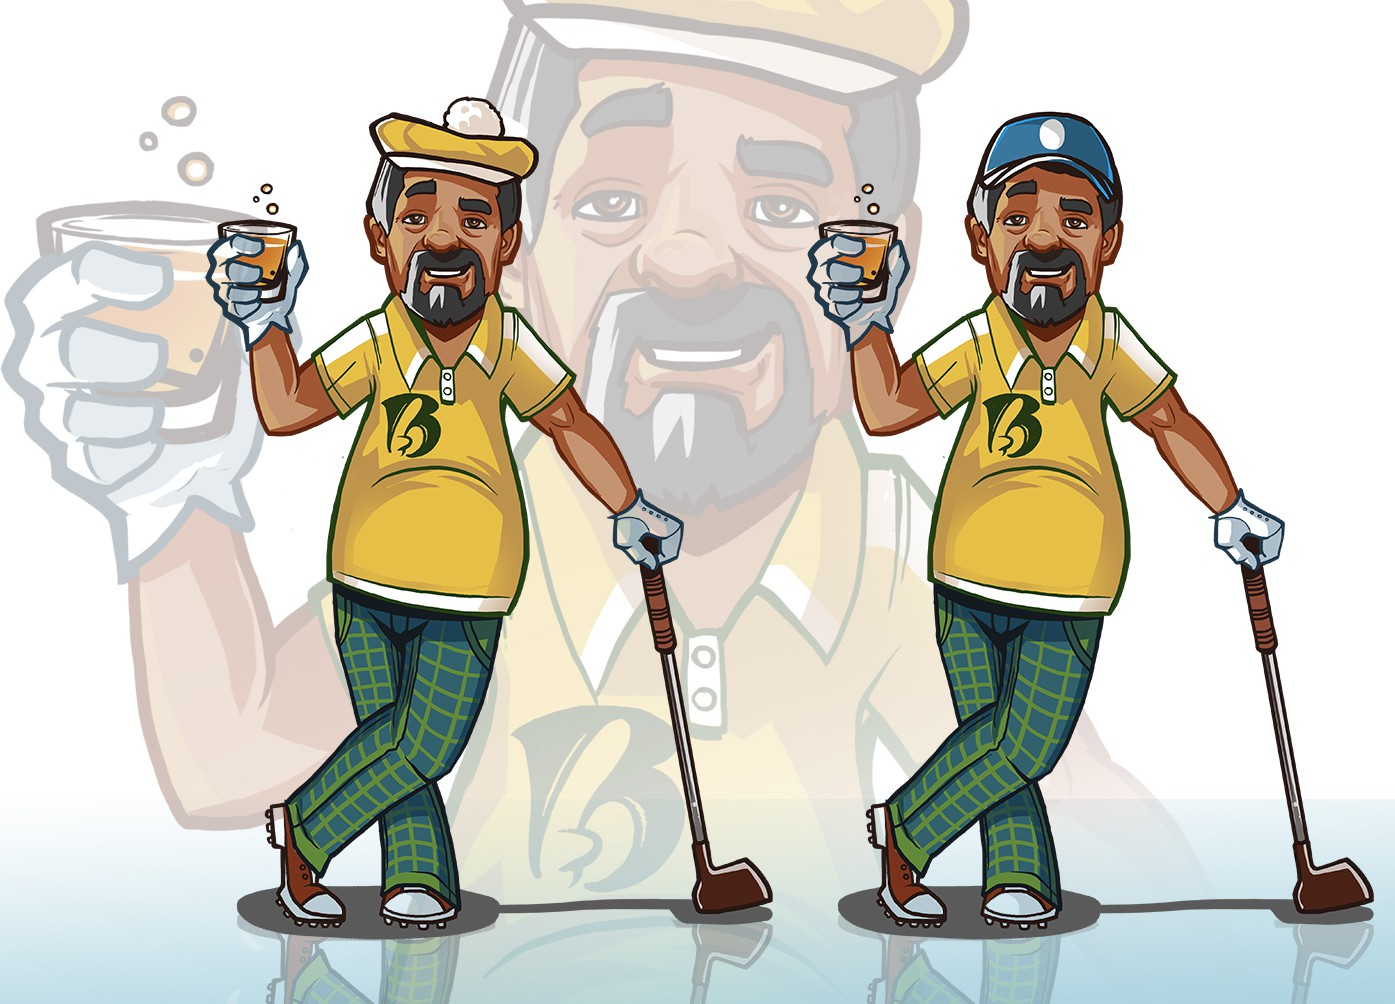 Cartoon Illustrator for new company brand